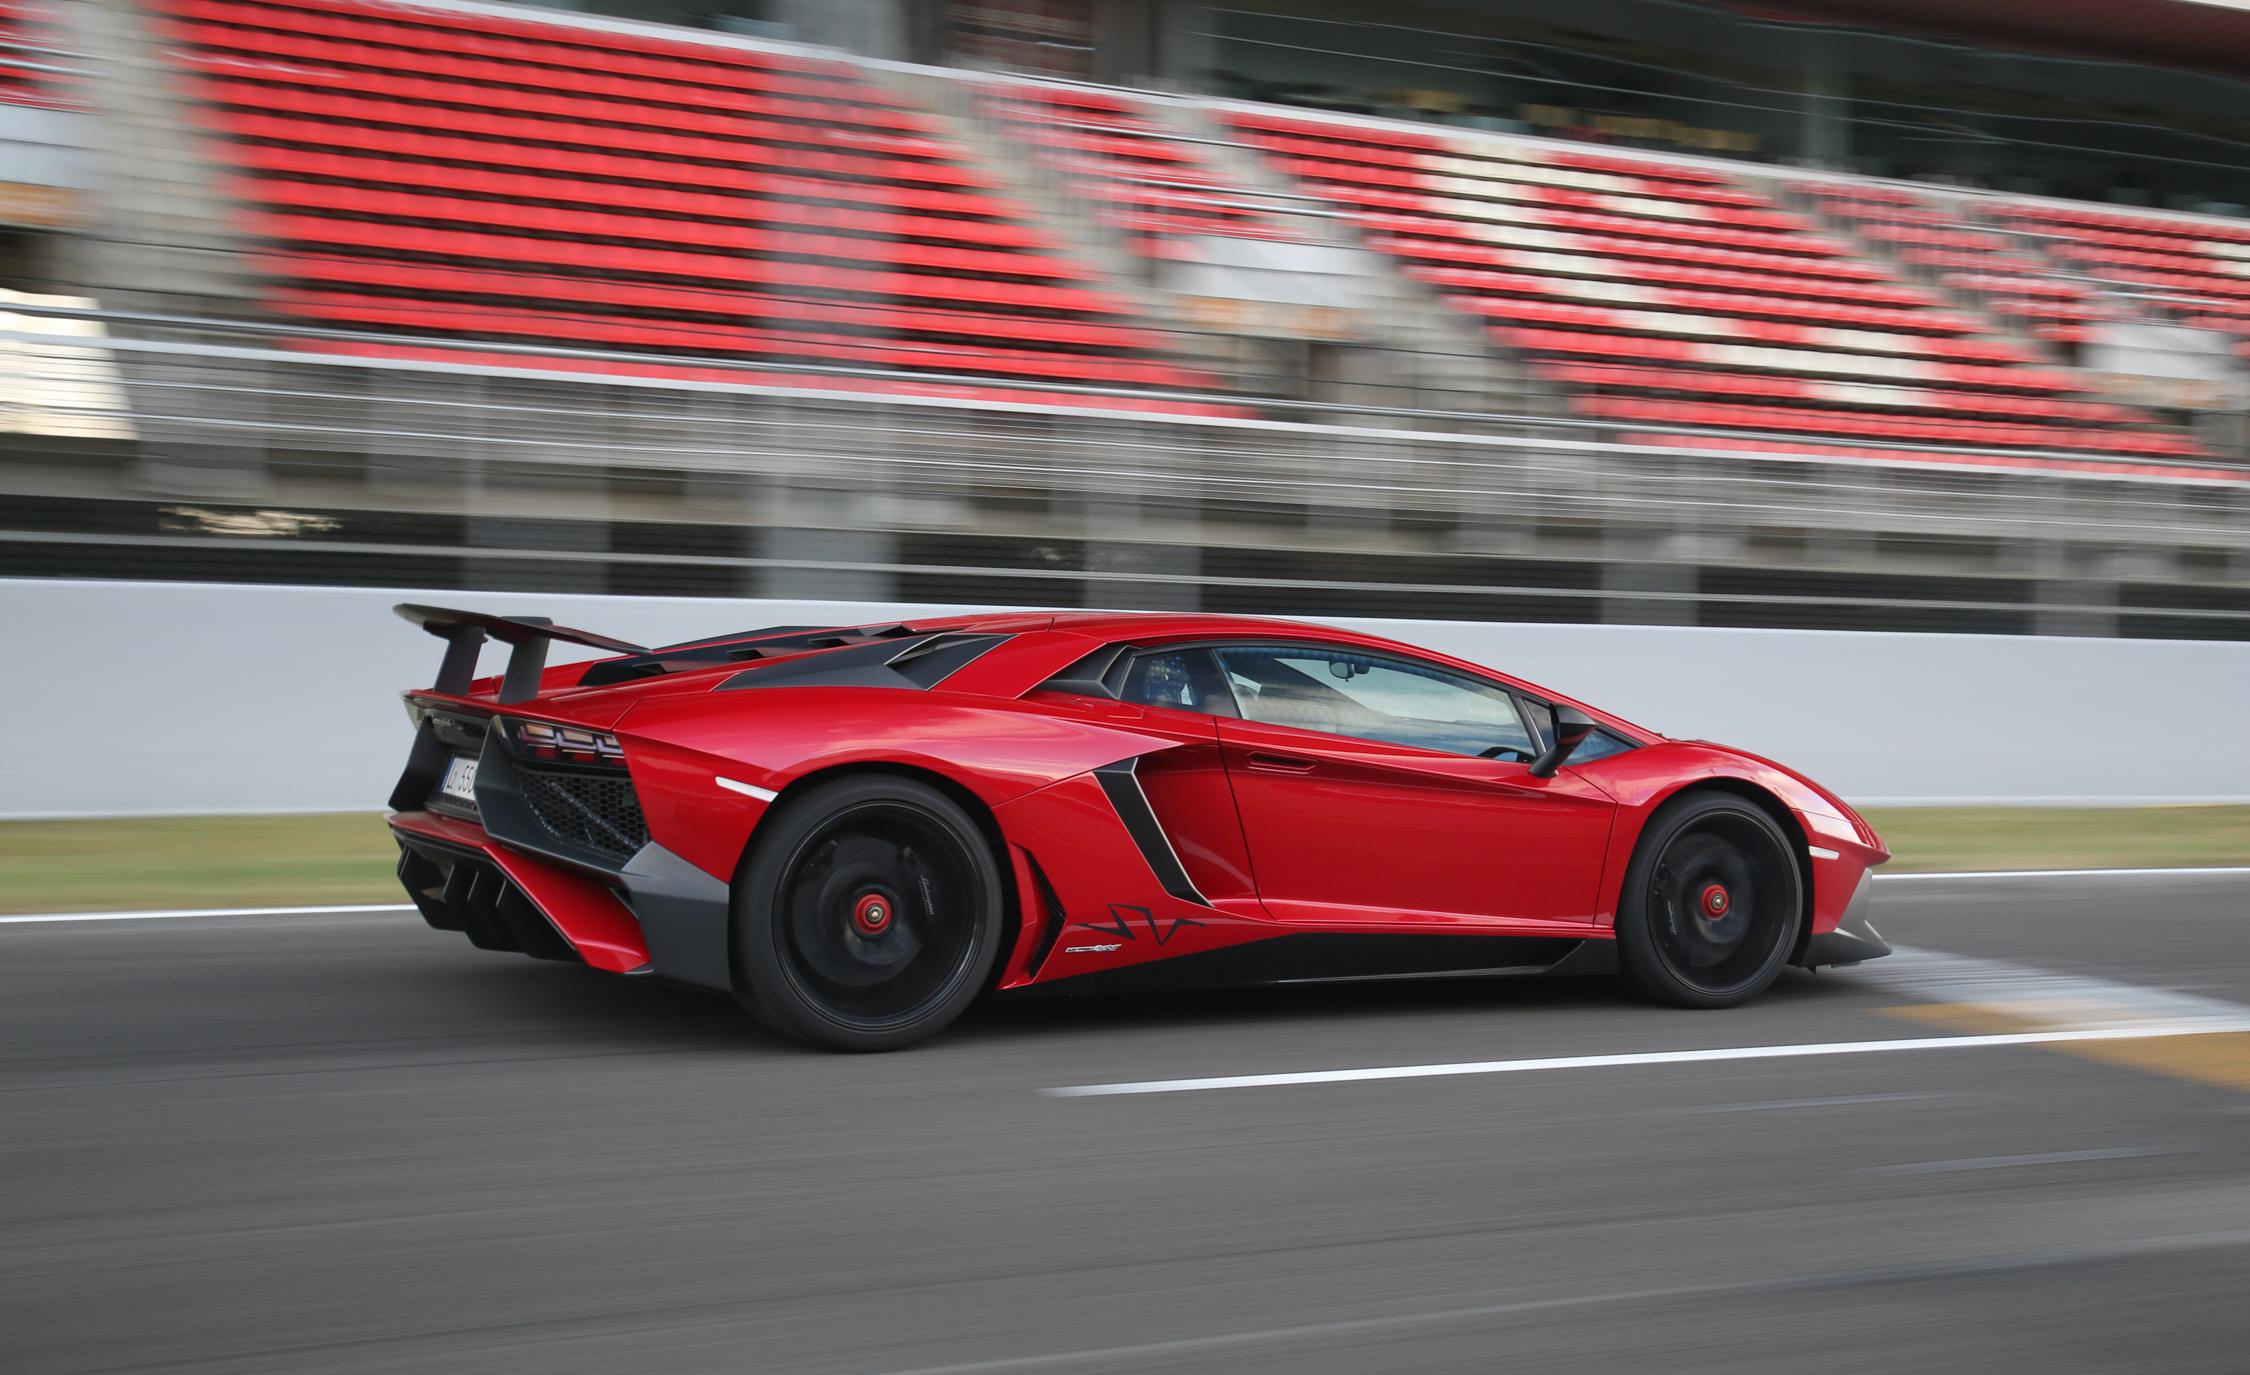 2016 Lamborghini Aventador LP750 4 SV (Photo 36 of 48)